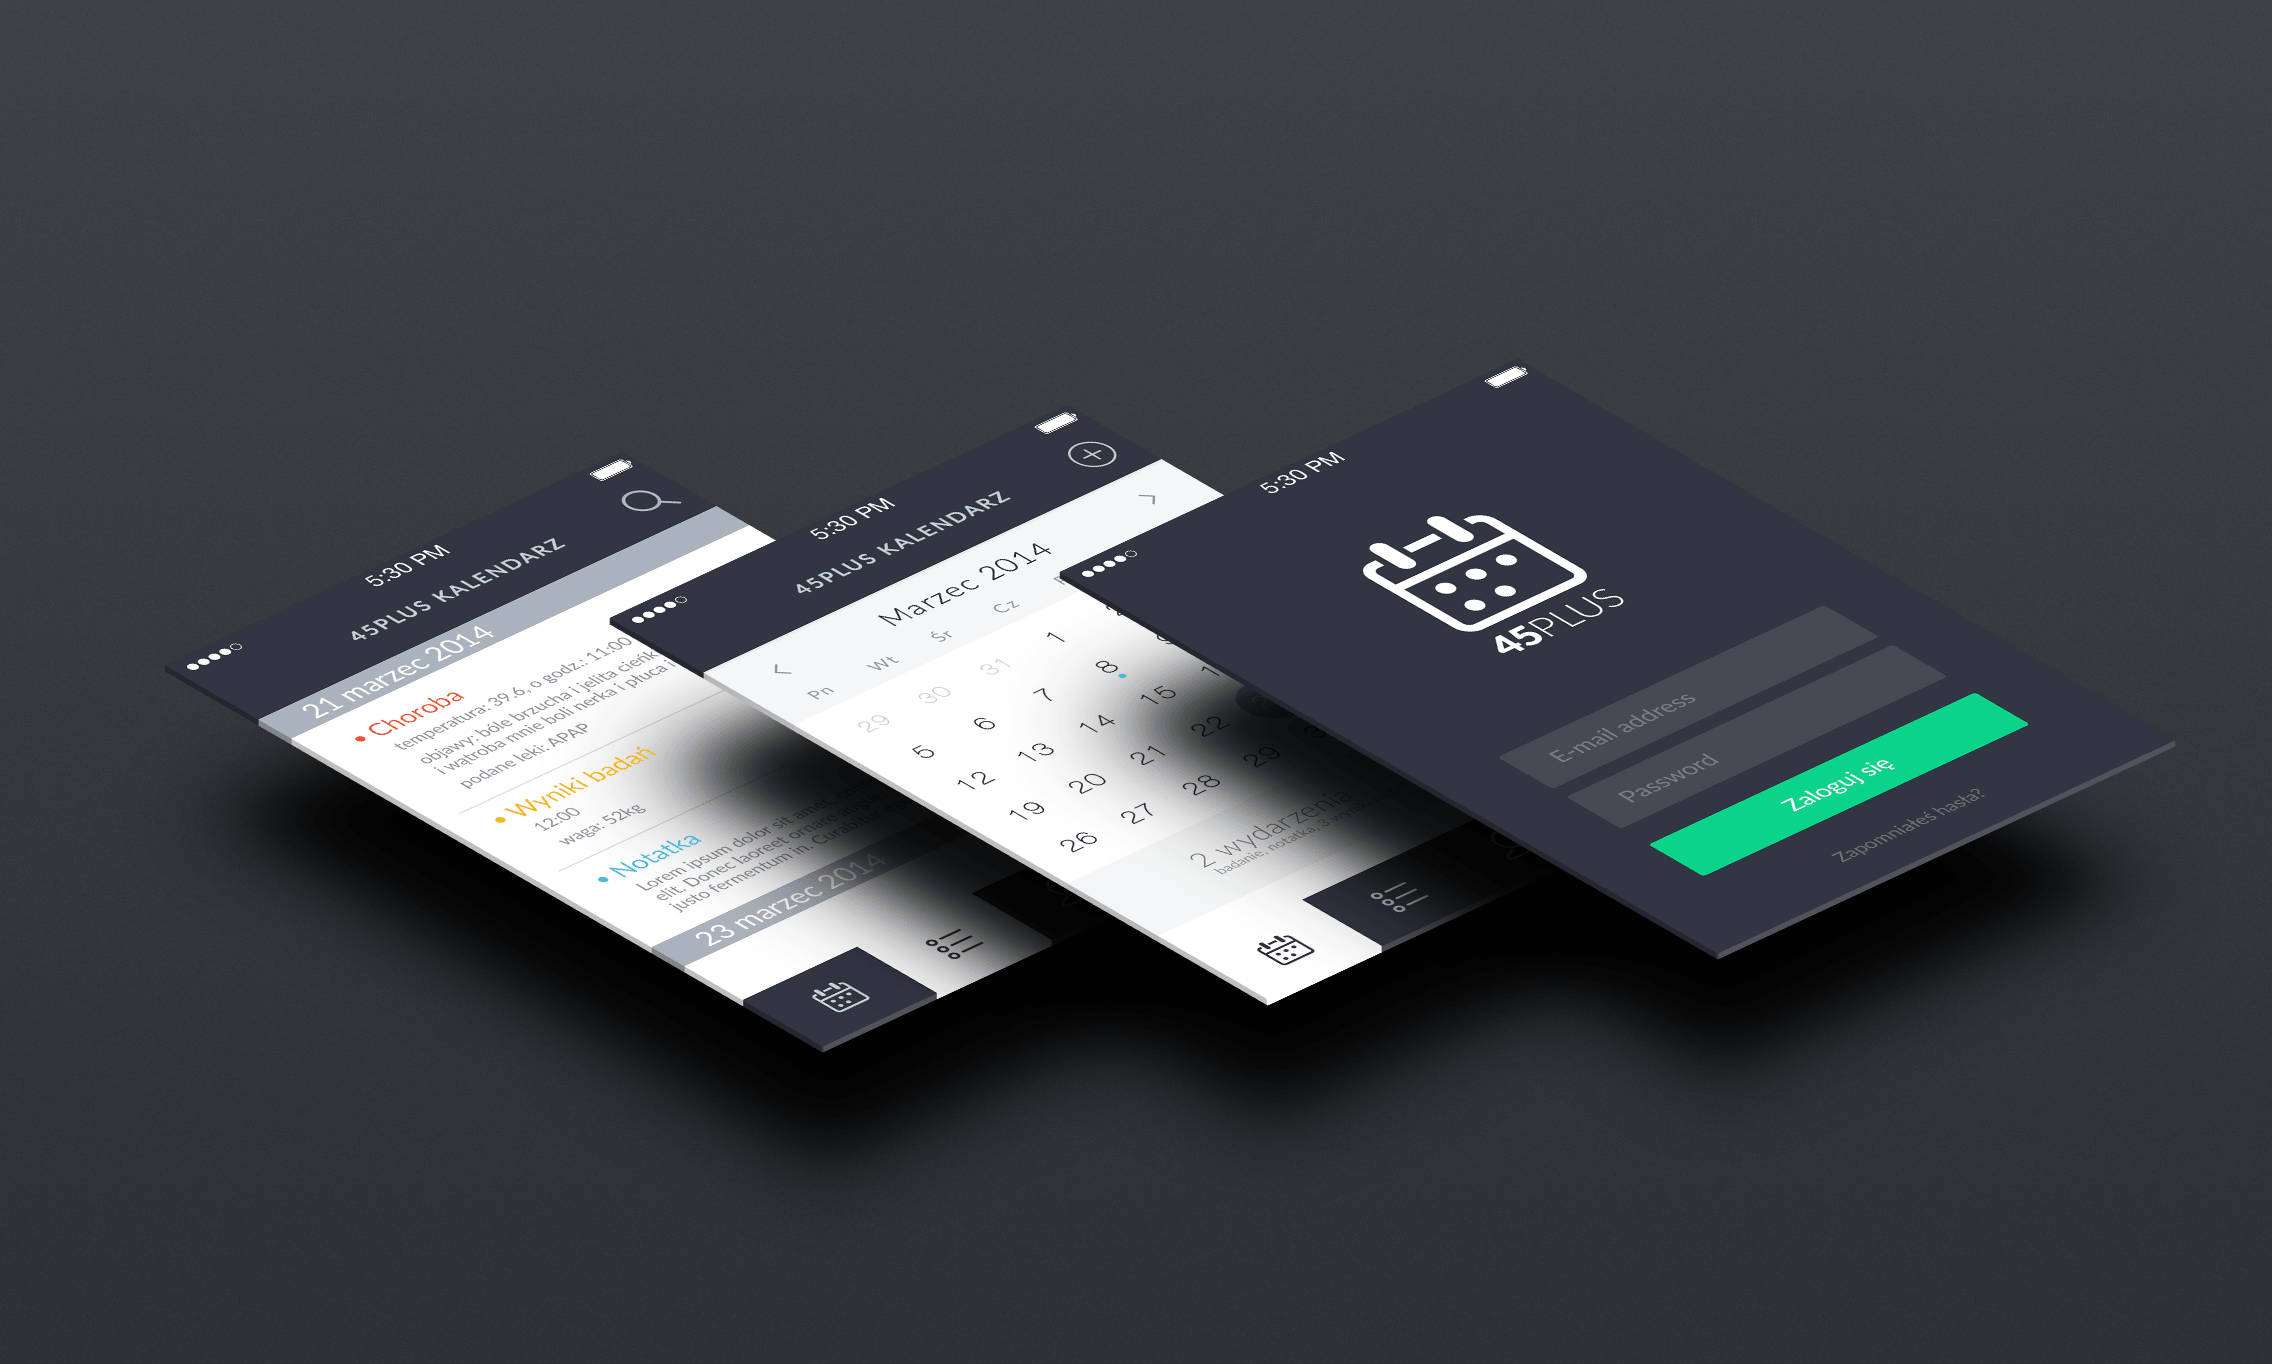 45plus_kalendarz-app